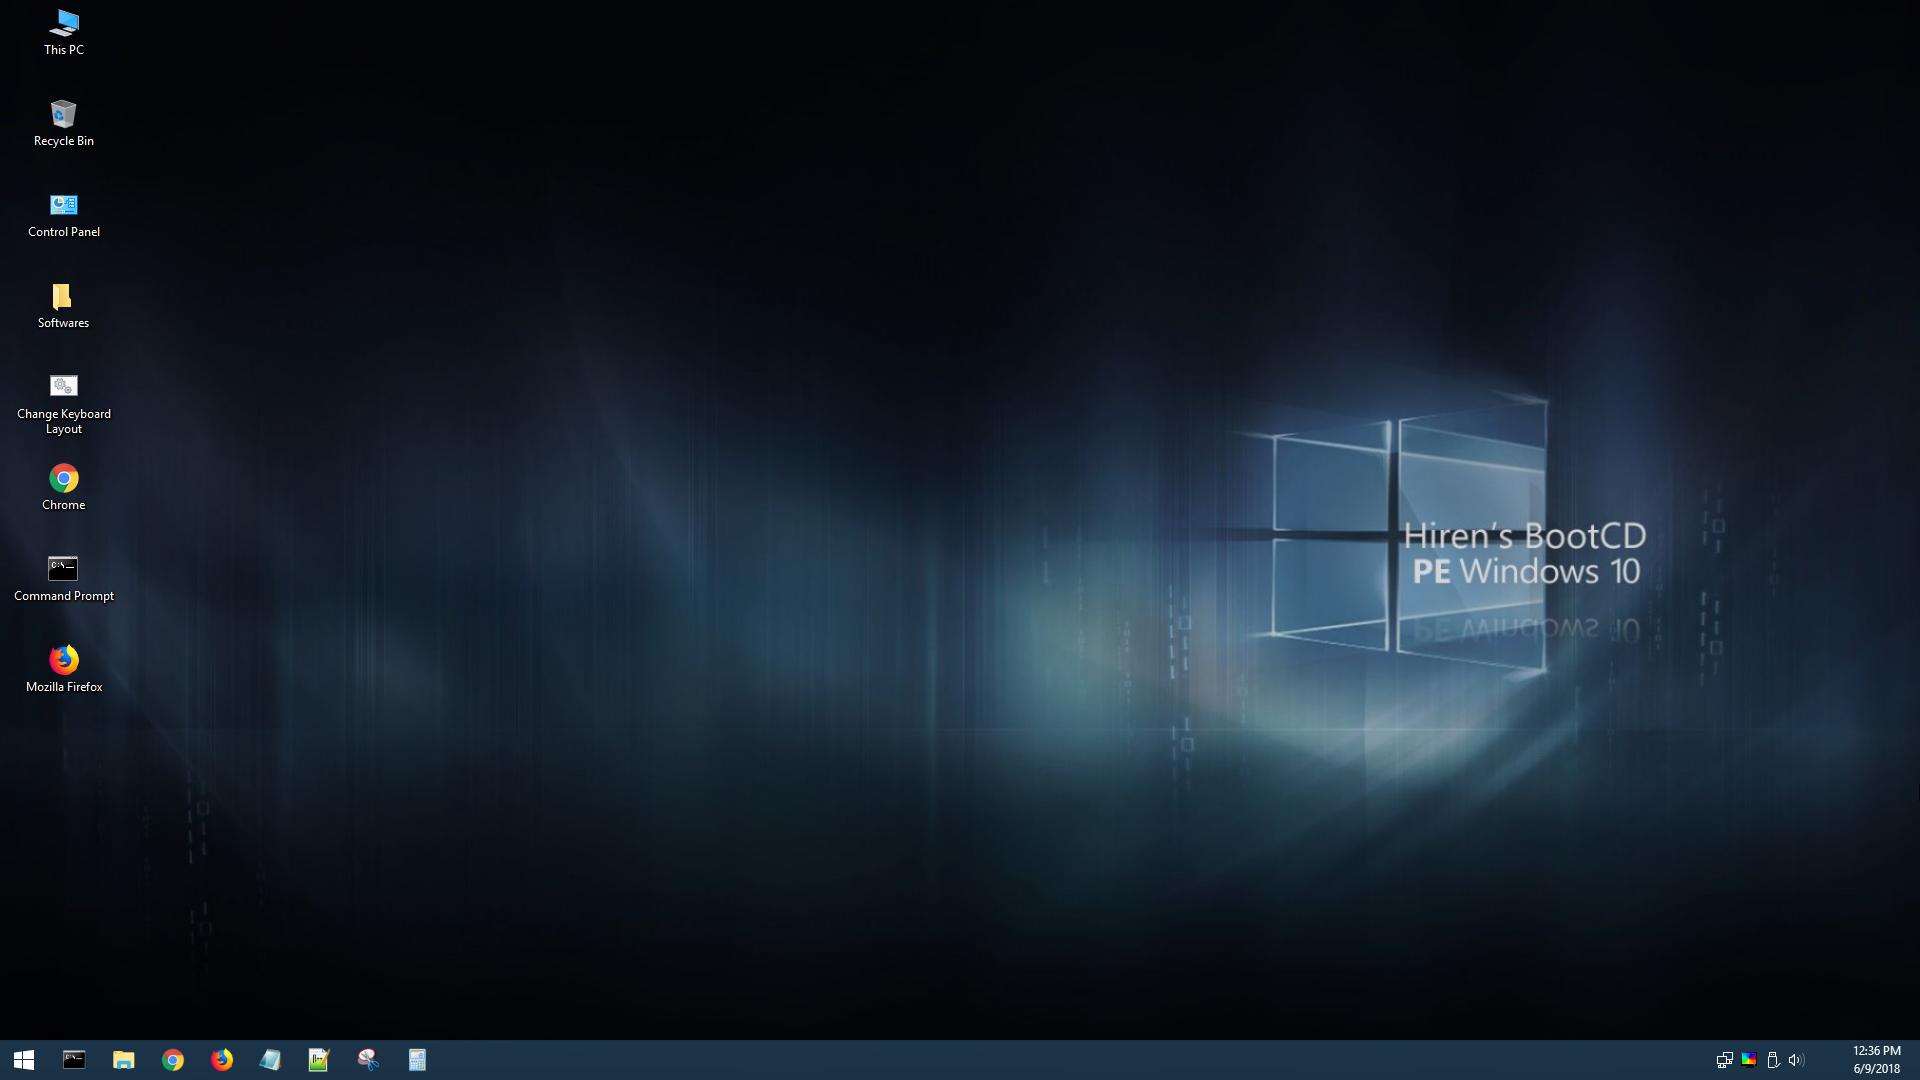 Hiren's BootCD PE screenshot (620 pix)